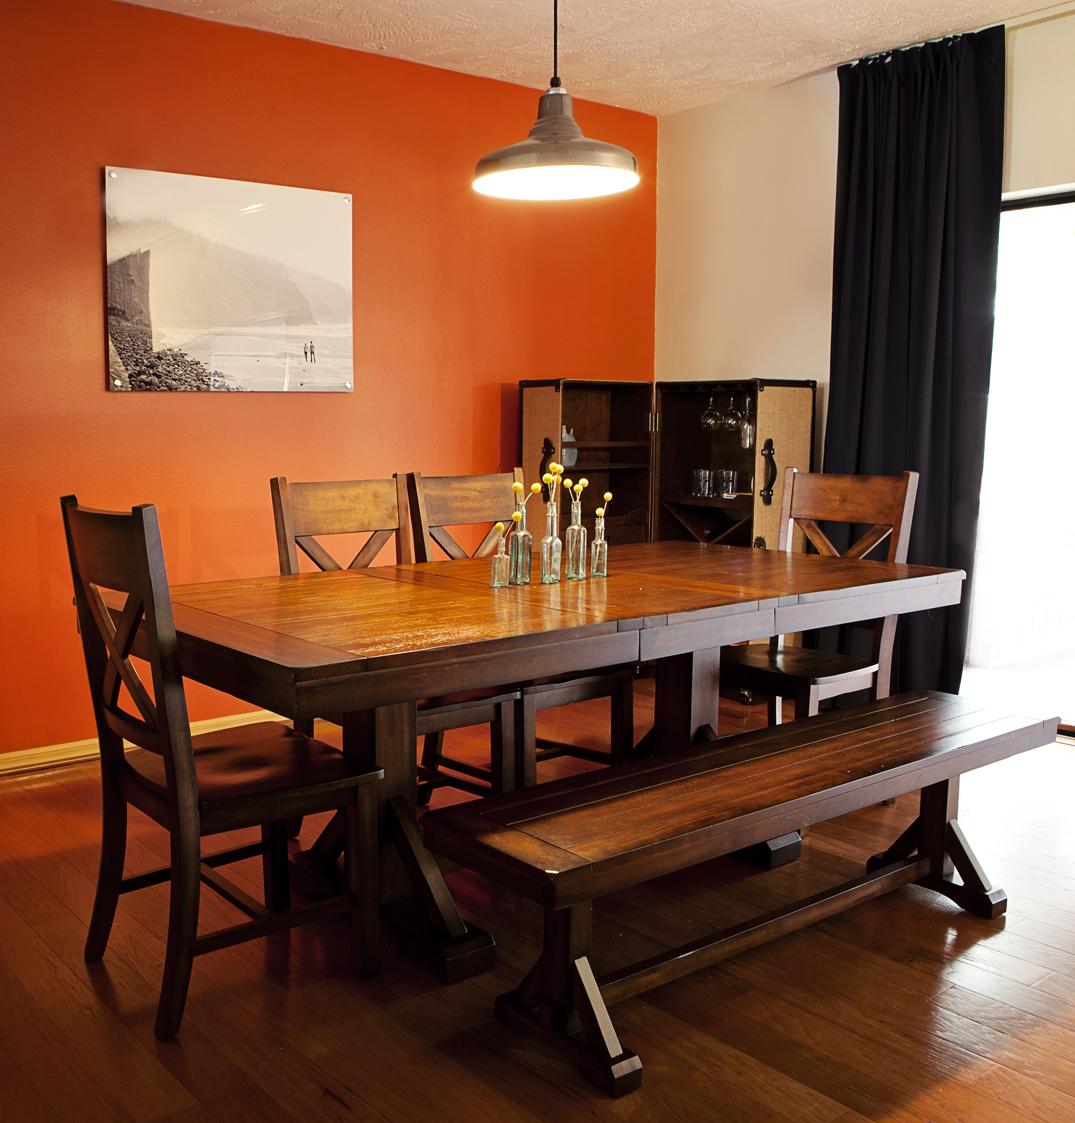 25 Midcentury Dining Room Design Ideas Decoration Love